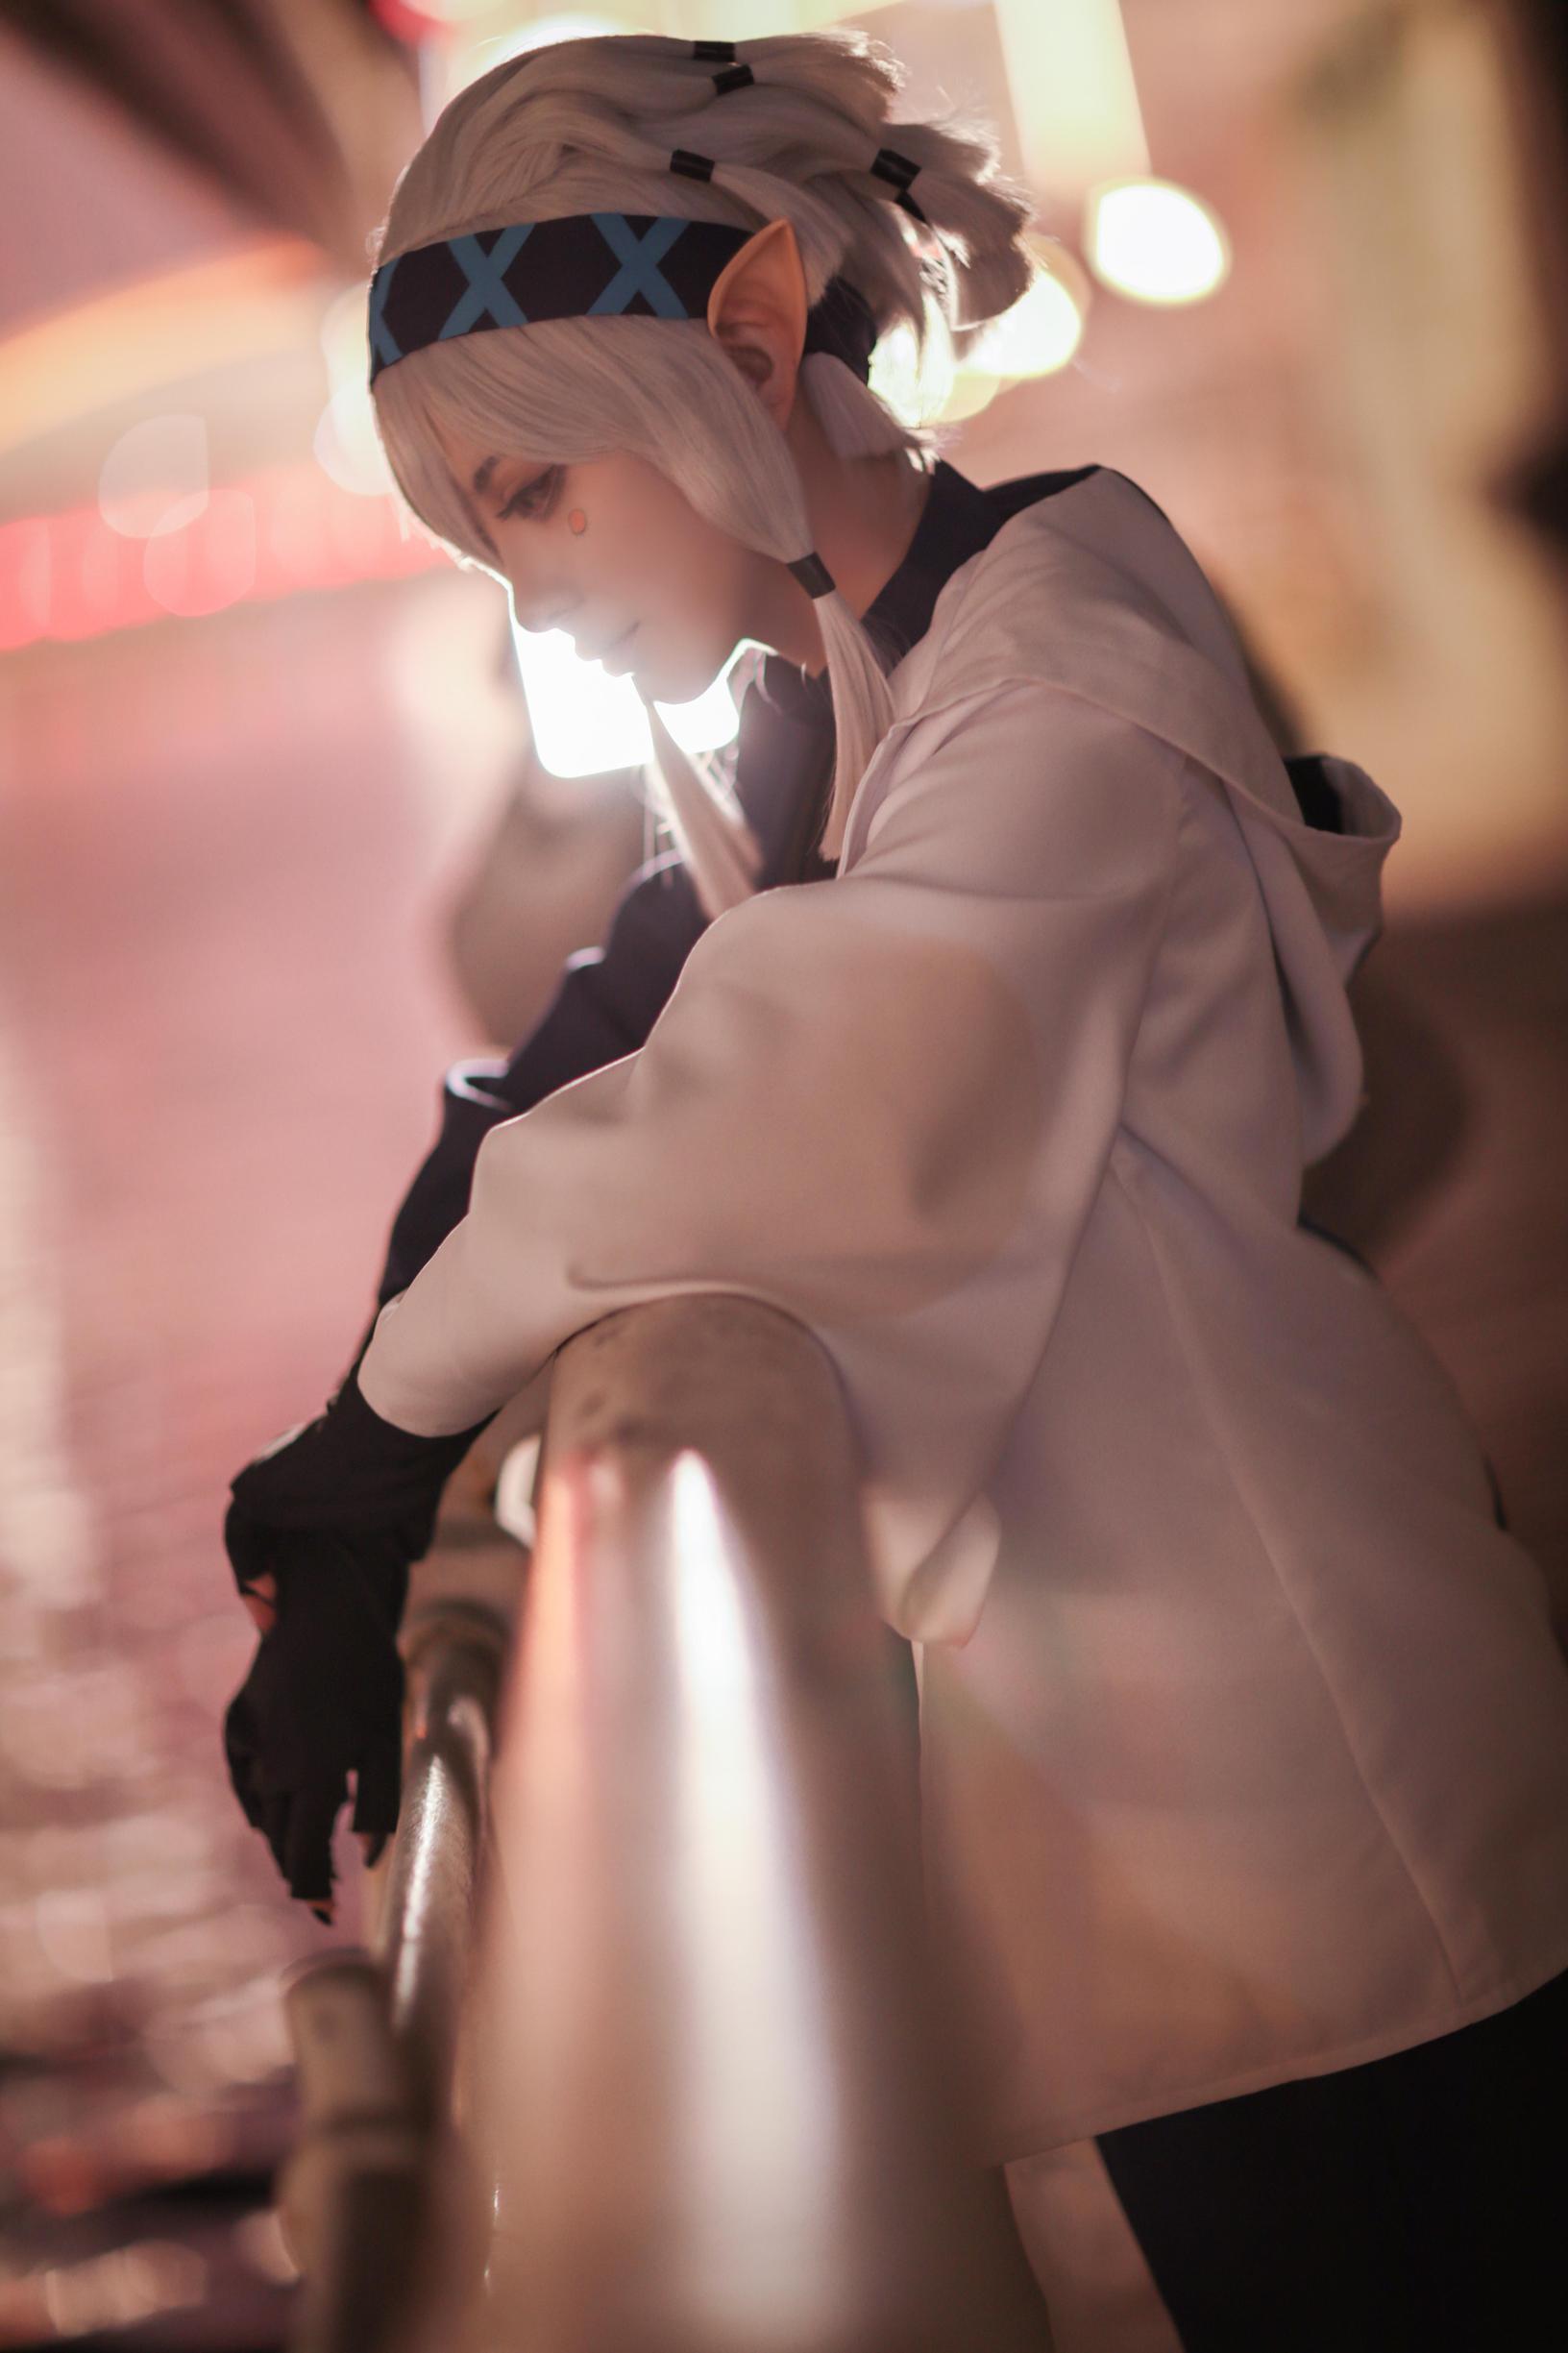 《凹凸世界》正片cosplay【CN:等待幸运の恒星】-第4张